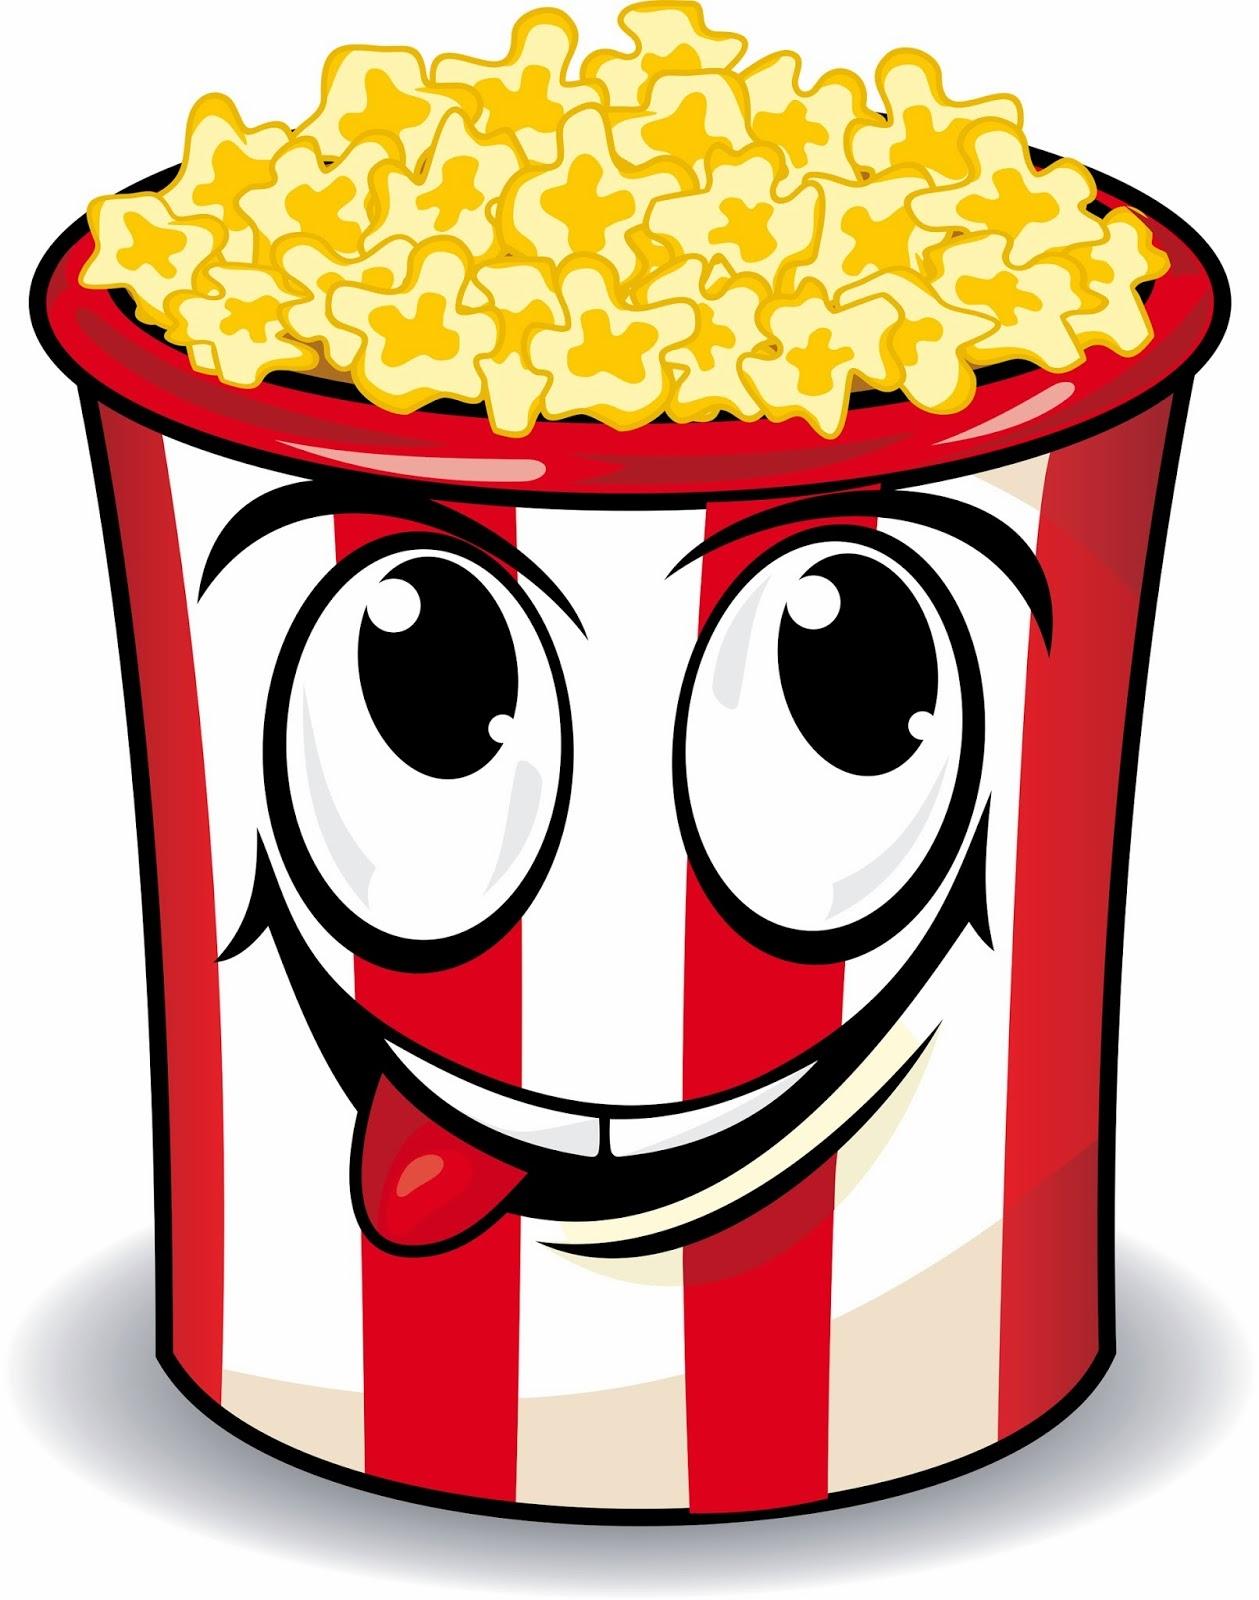 Carnival popcorn clipart.